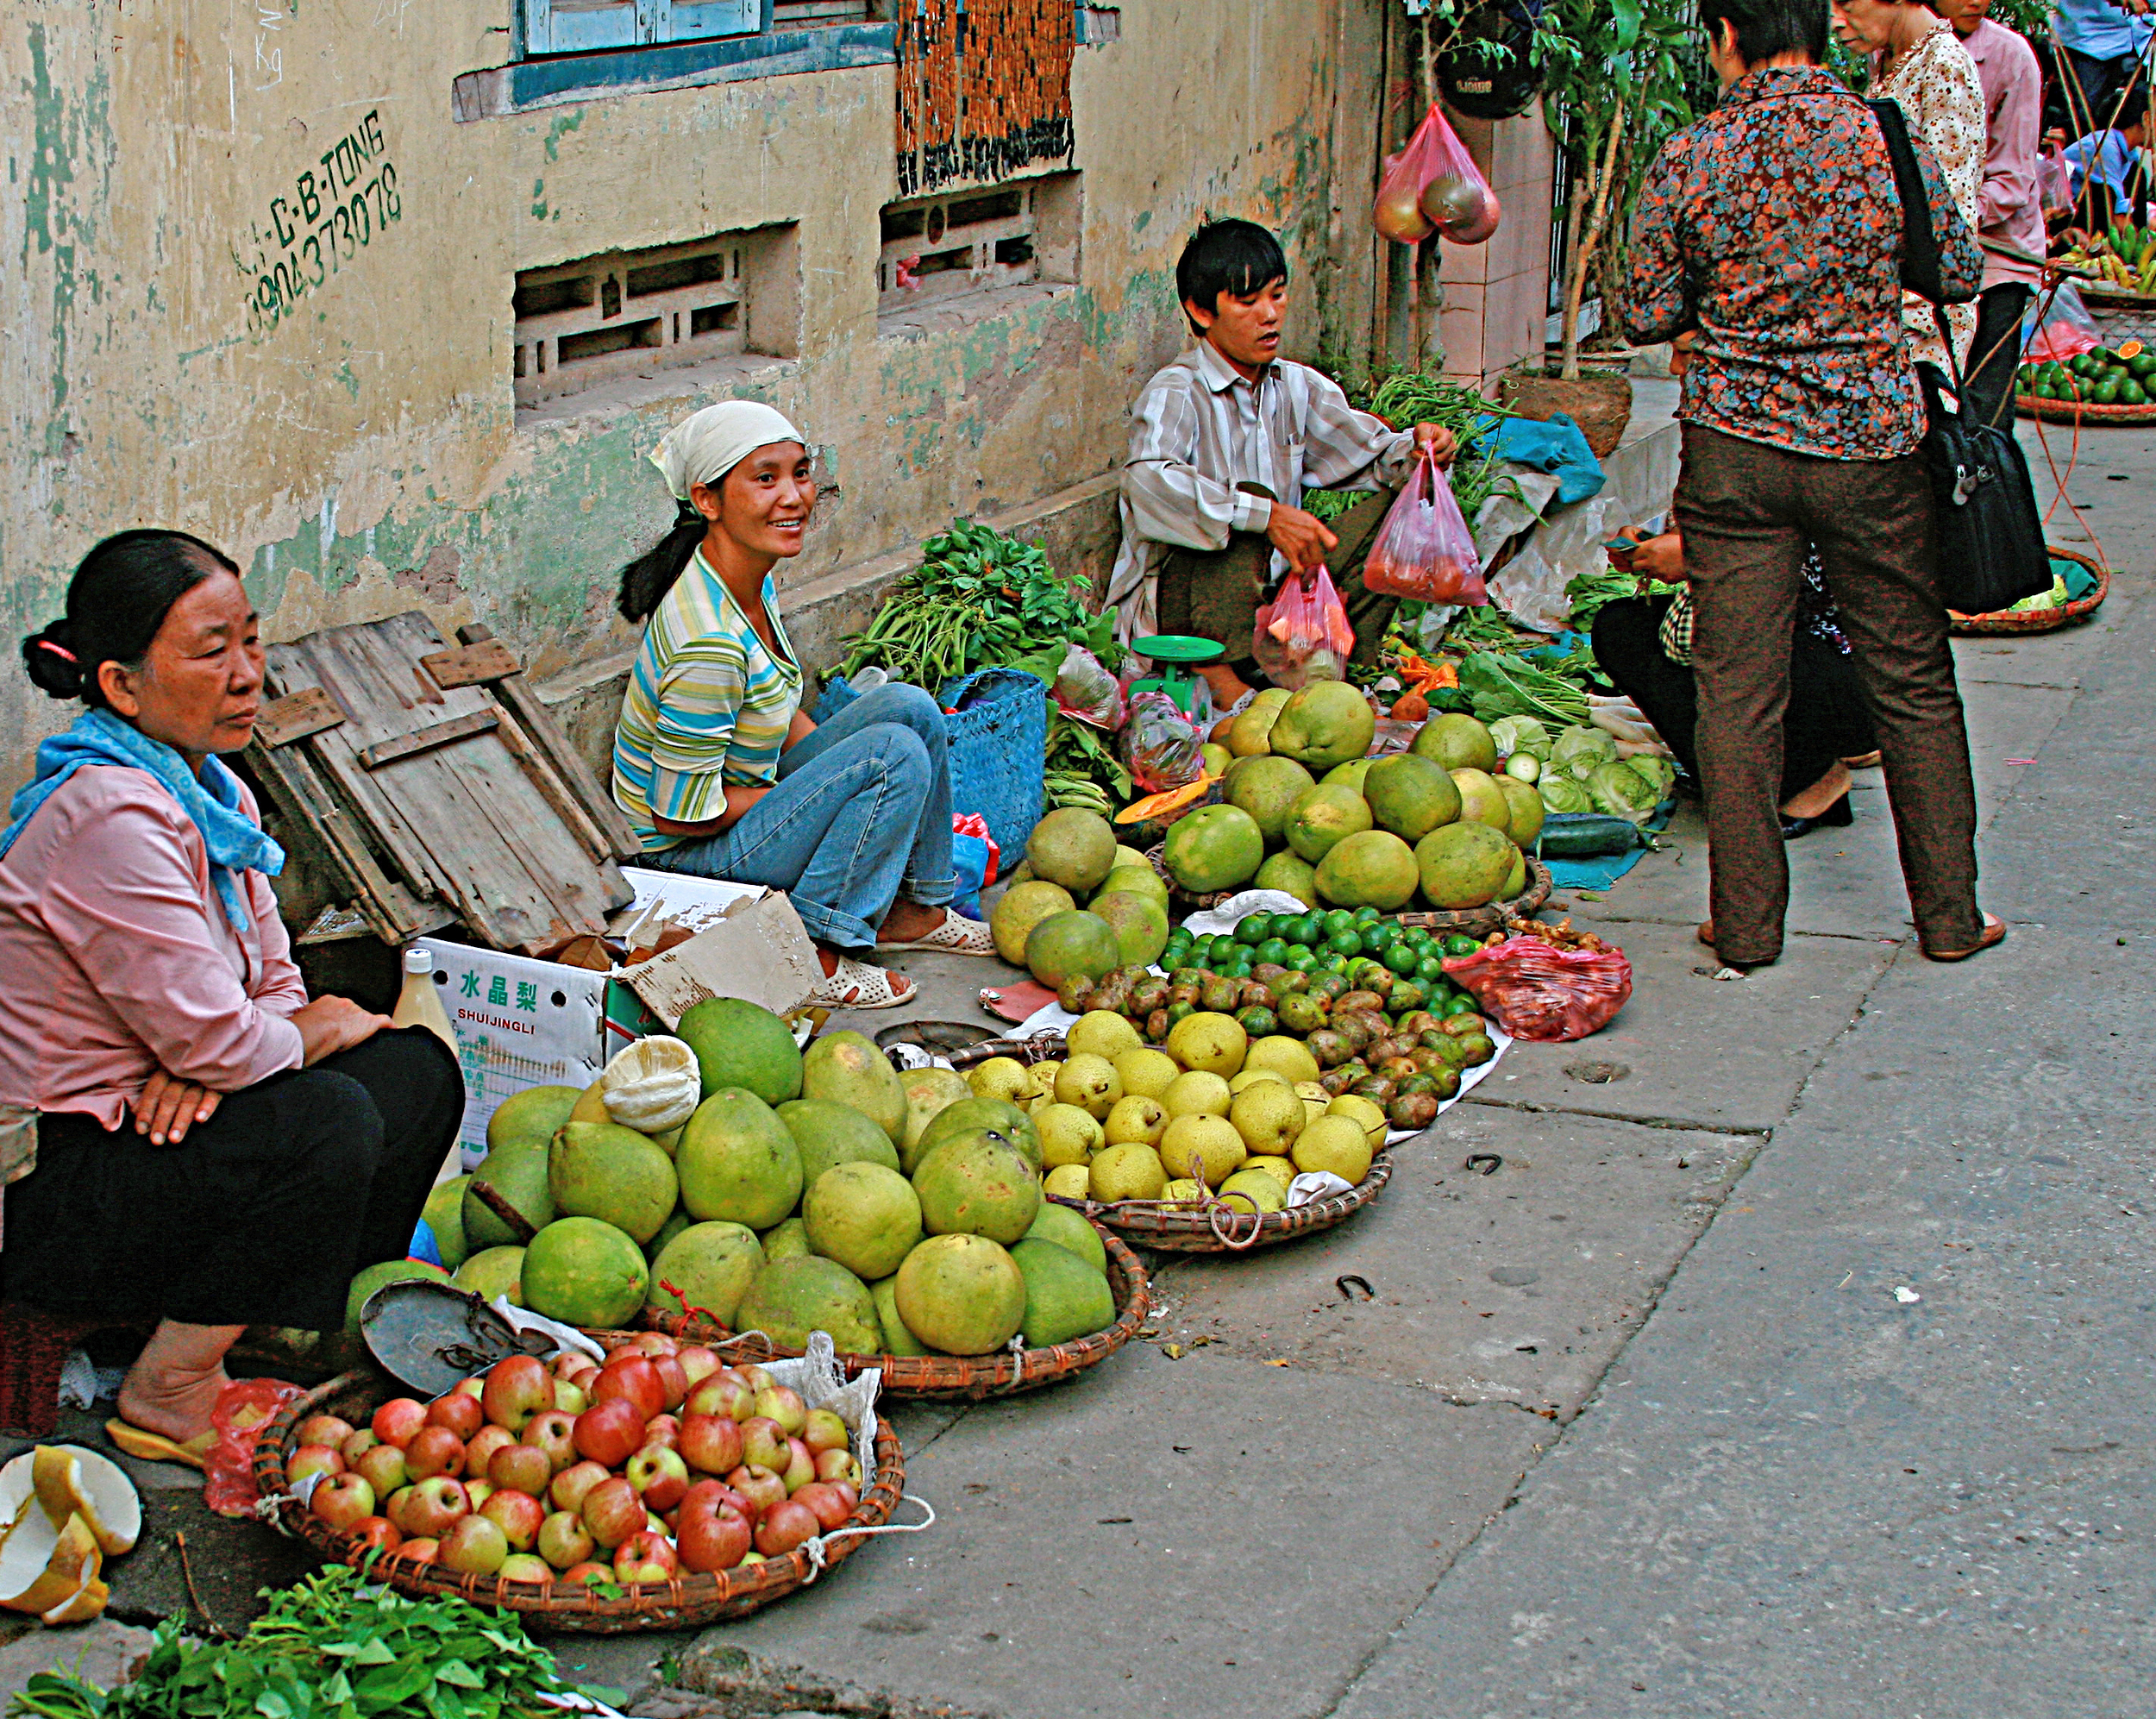 Market_057a.jpg